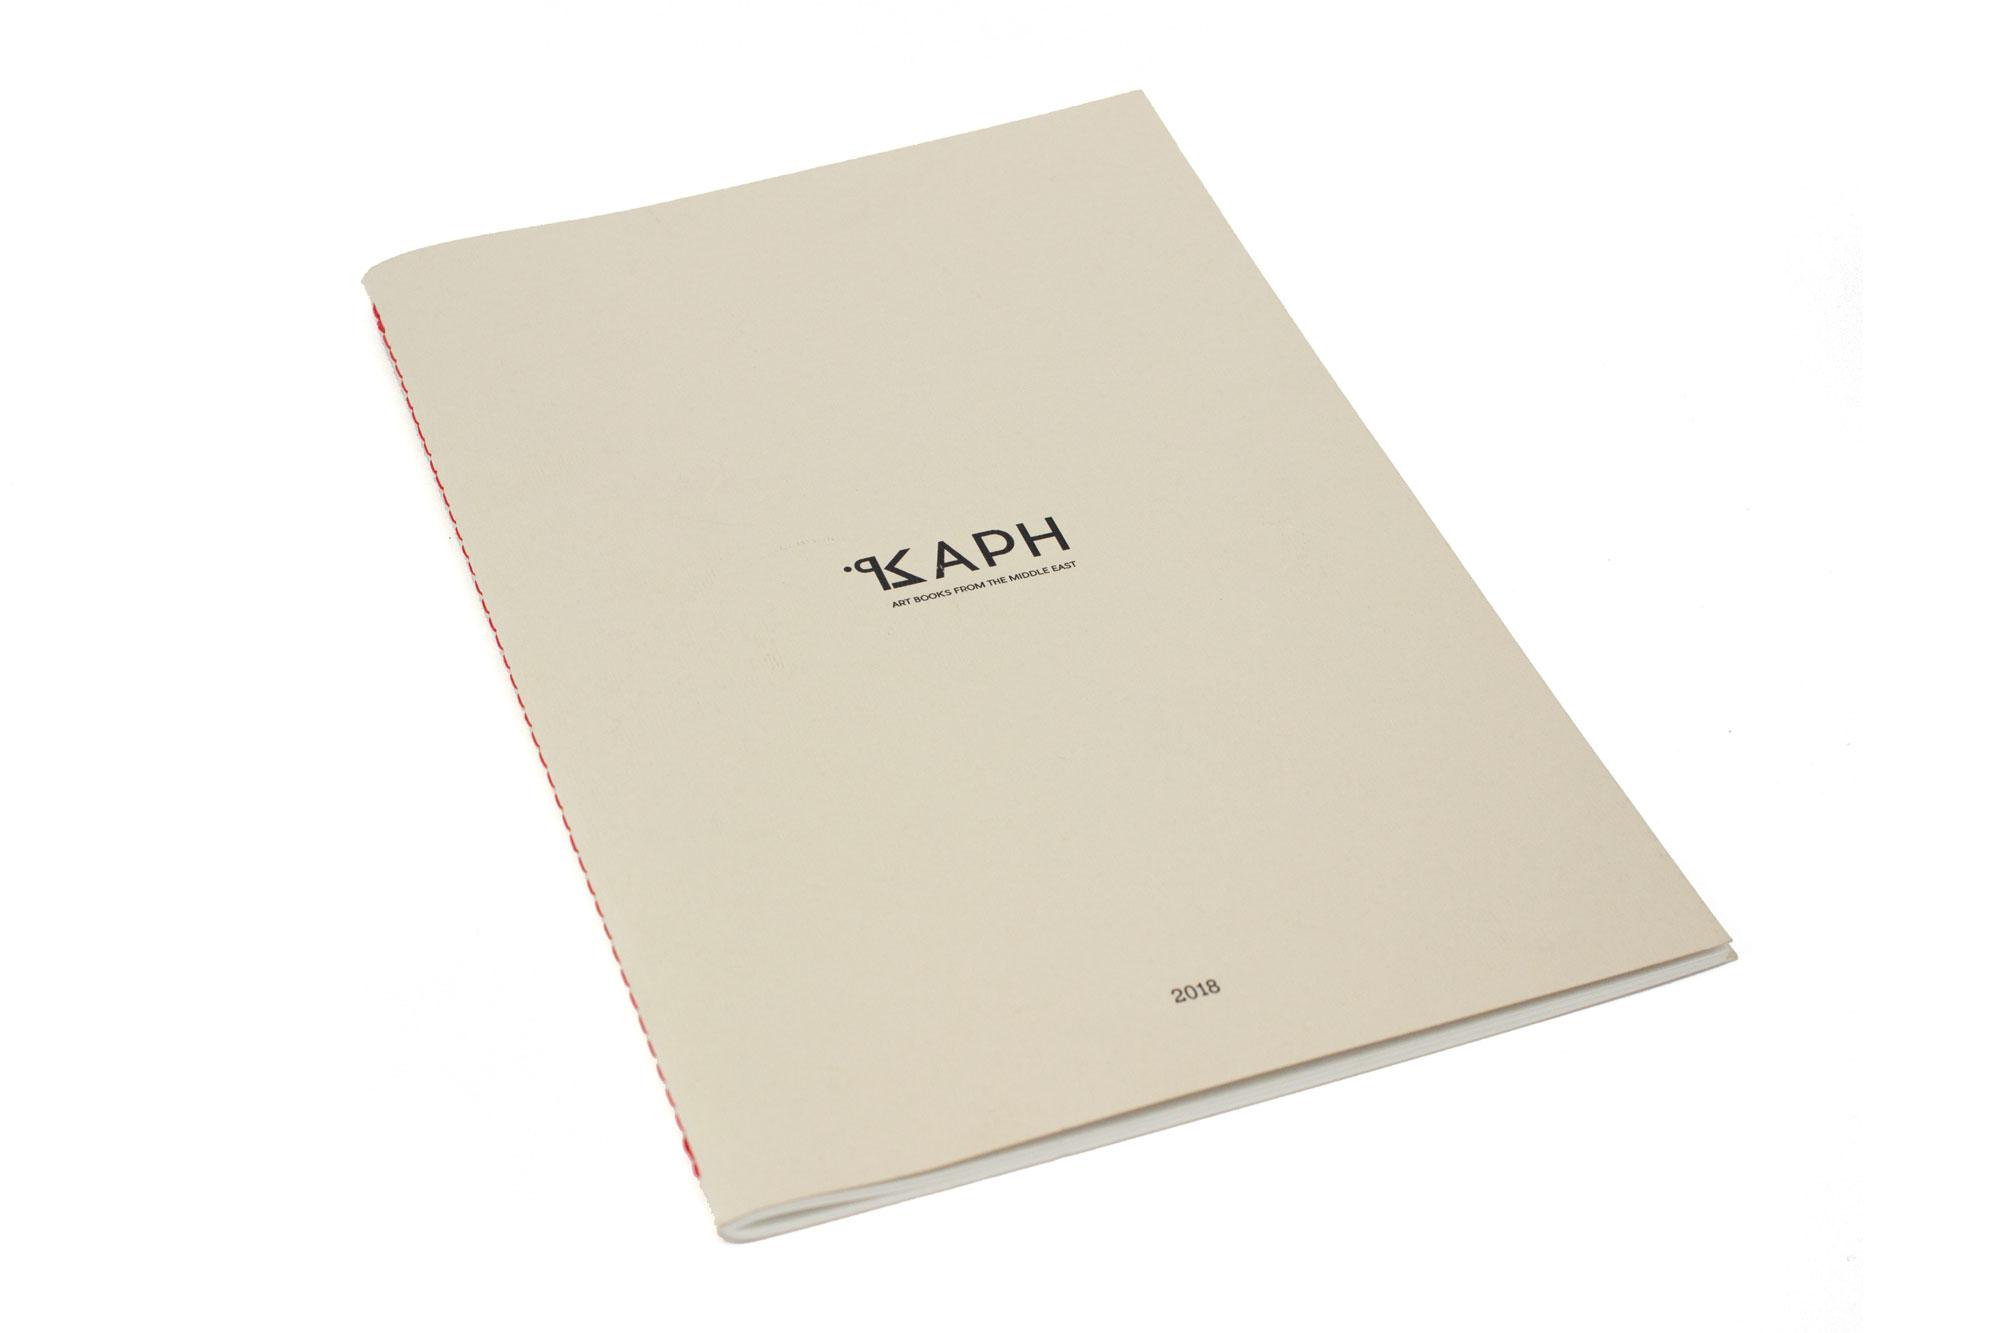 IMG_5407-Kaph-Catalogue.jpg